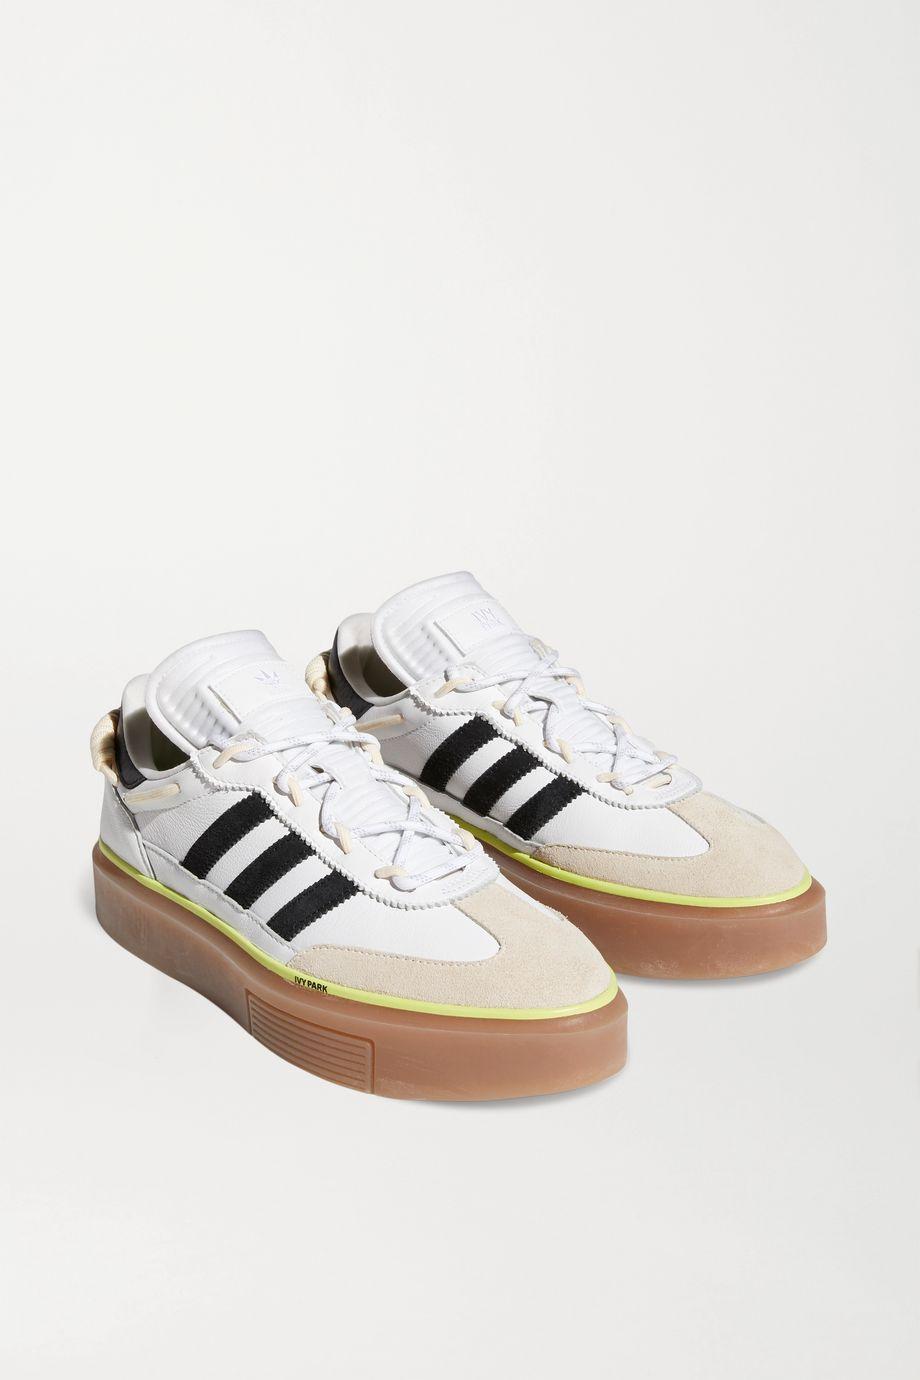 adidas Originals + Ivy Park Supersleek leather, neoprene and suede sneakers